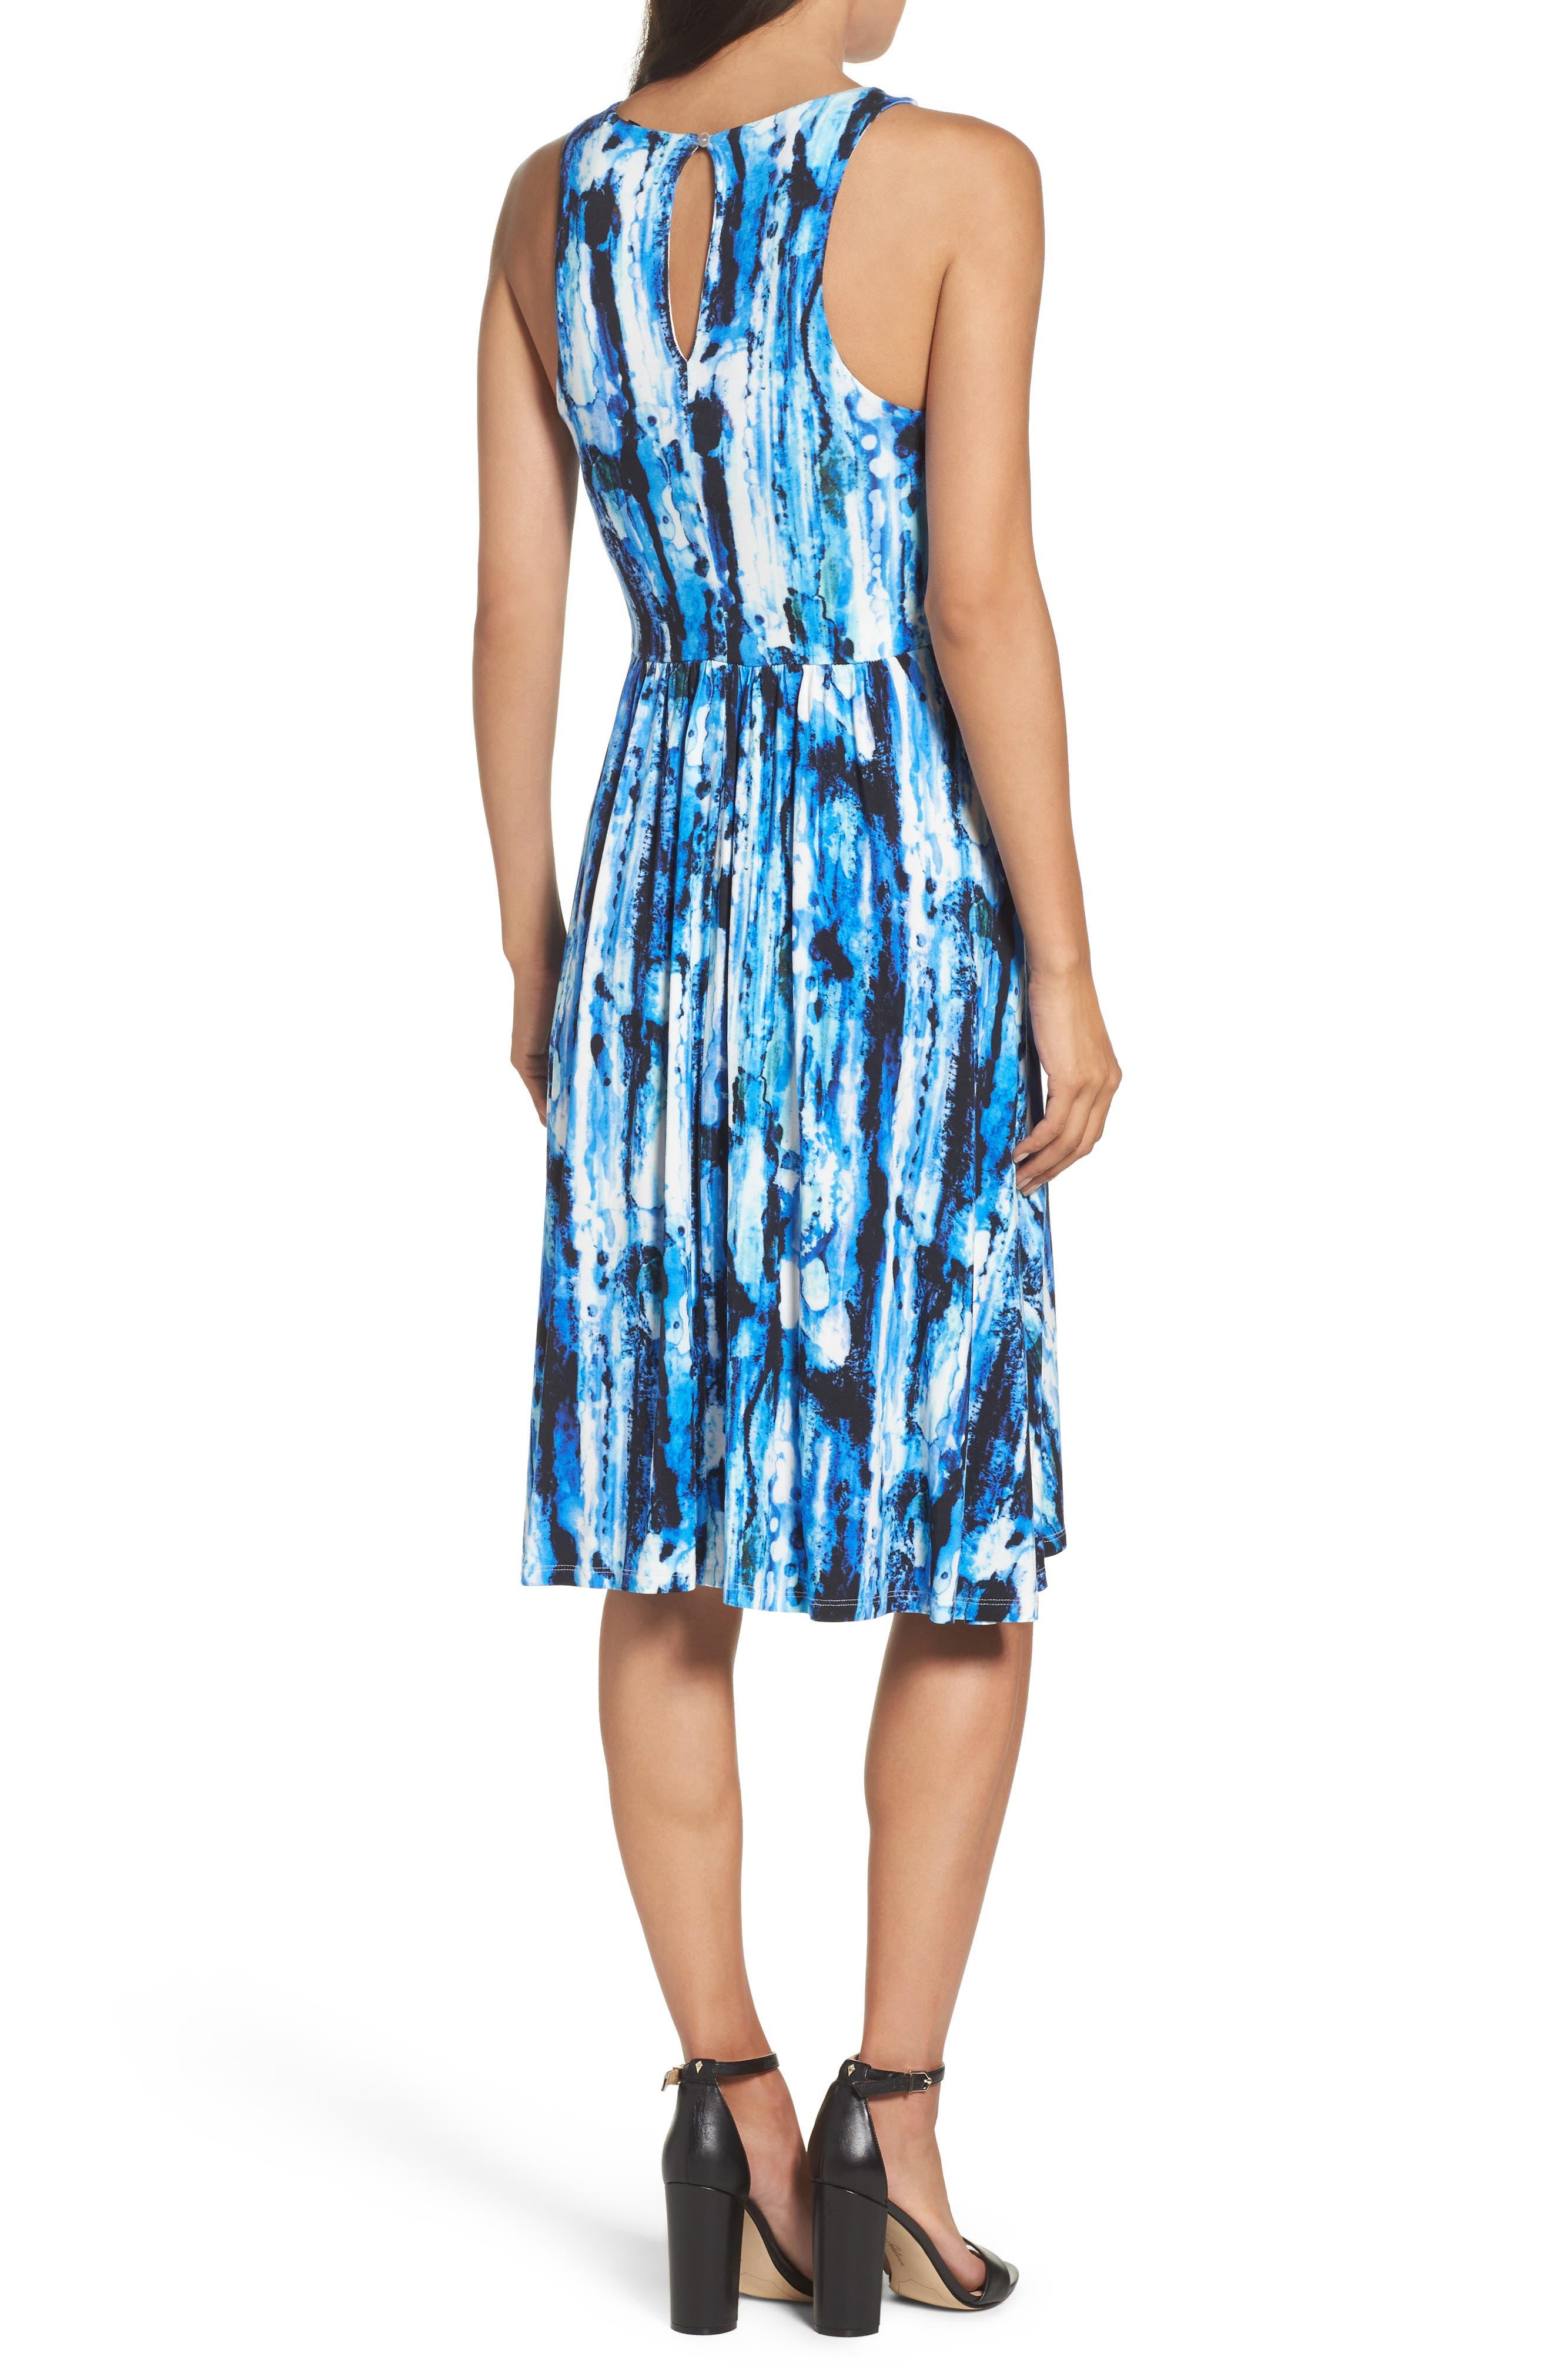 Alternate Image 2  - Felicity & Coco Print Fit & Flare Dress (Regular & Petite) (Nordstrom Exclusive)